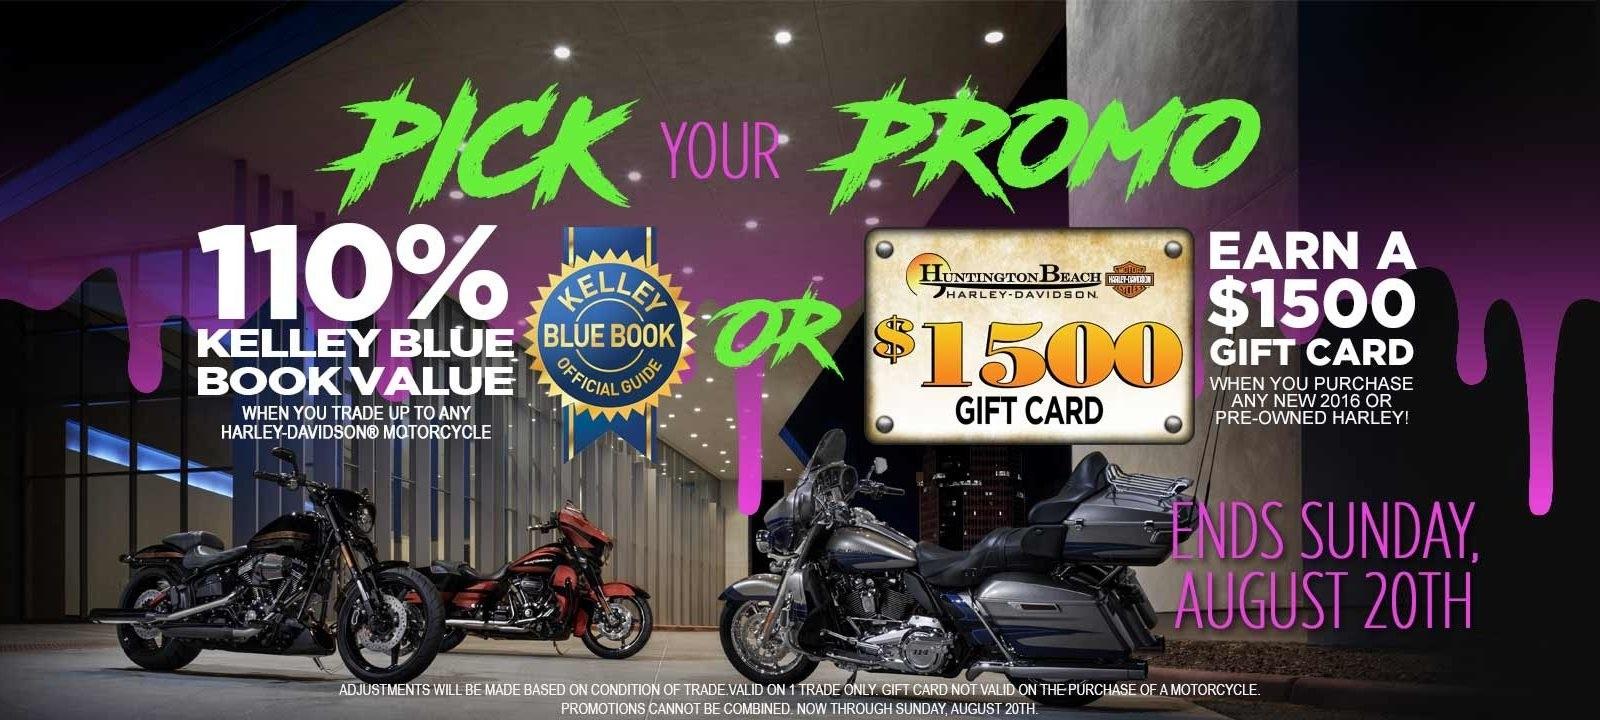 20170814-HBHD-1800x720-Pick-Your-Promo